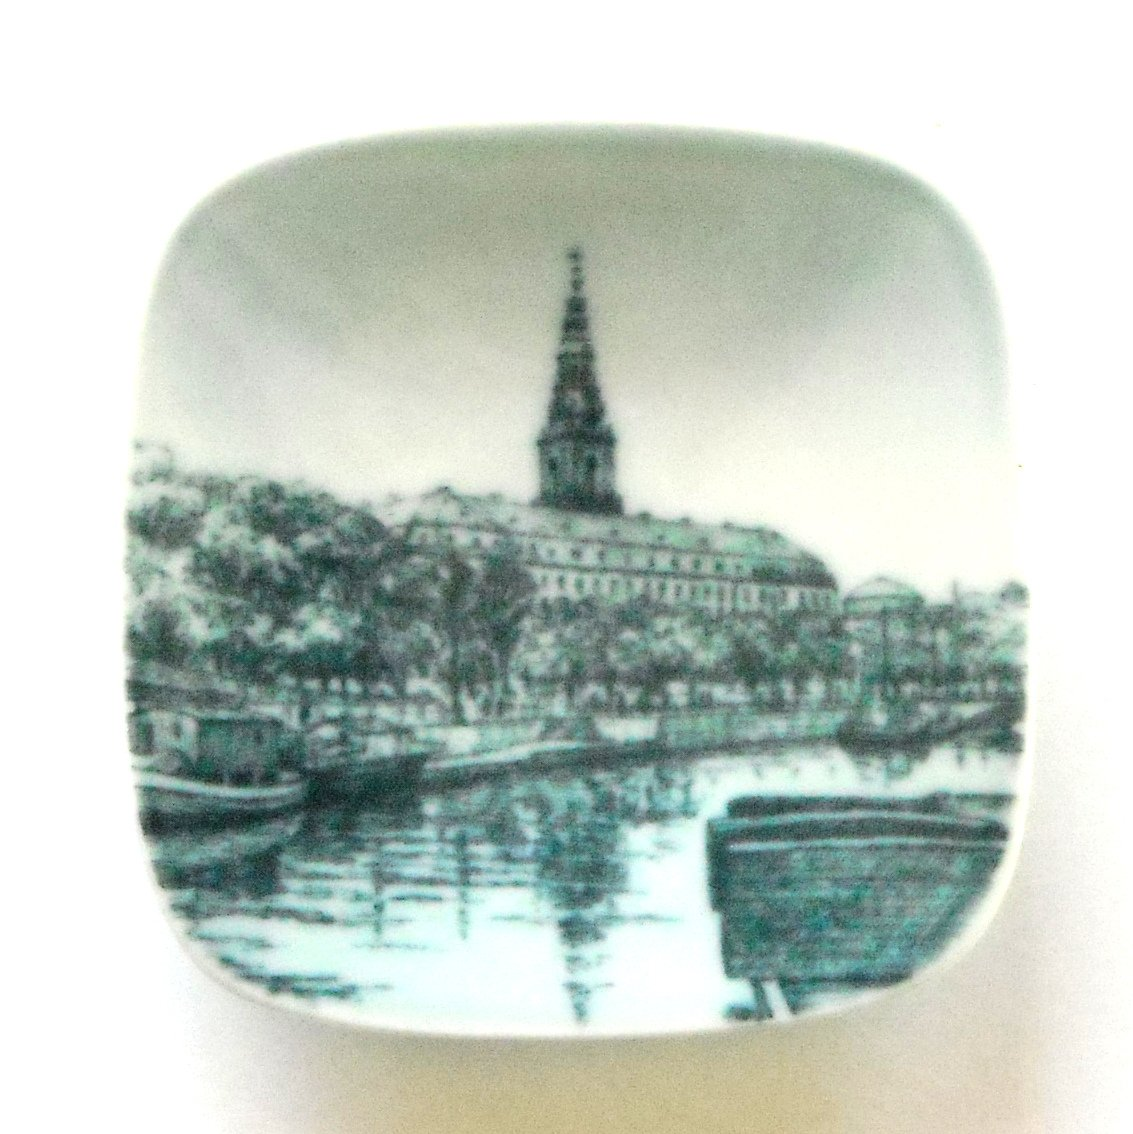 Christiansborg Palace Bing & Grondahl Copenhagen Denmark Small Plate Ornament